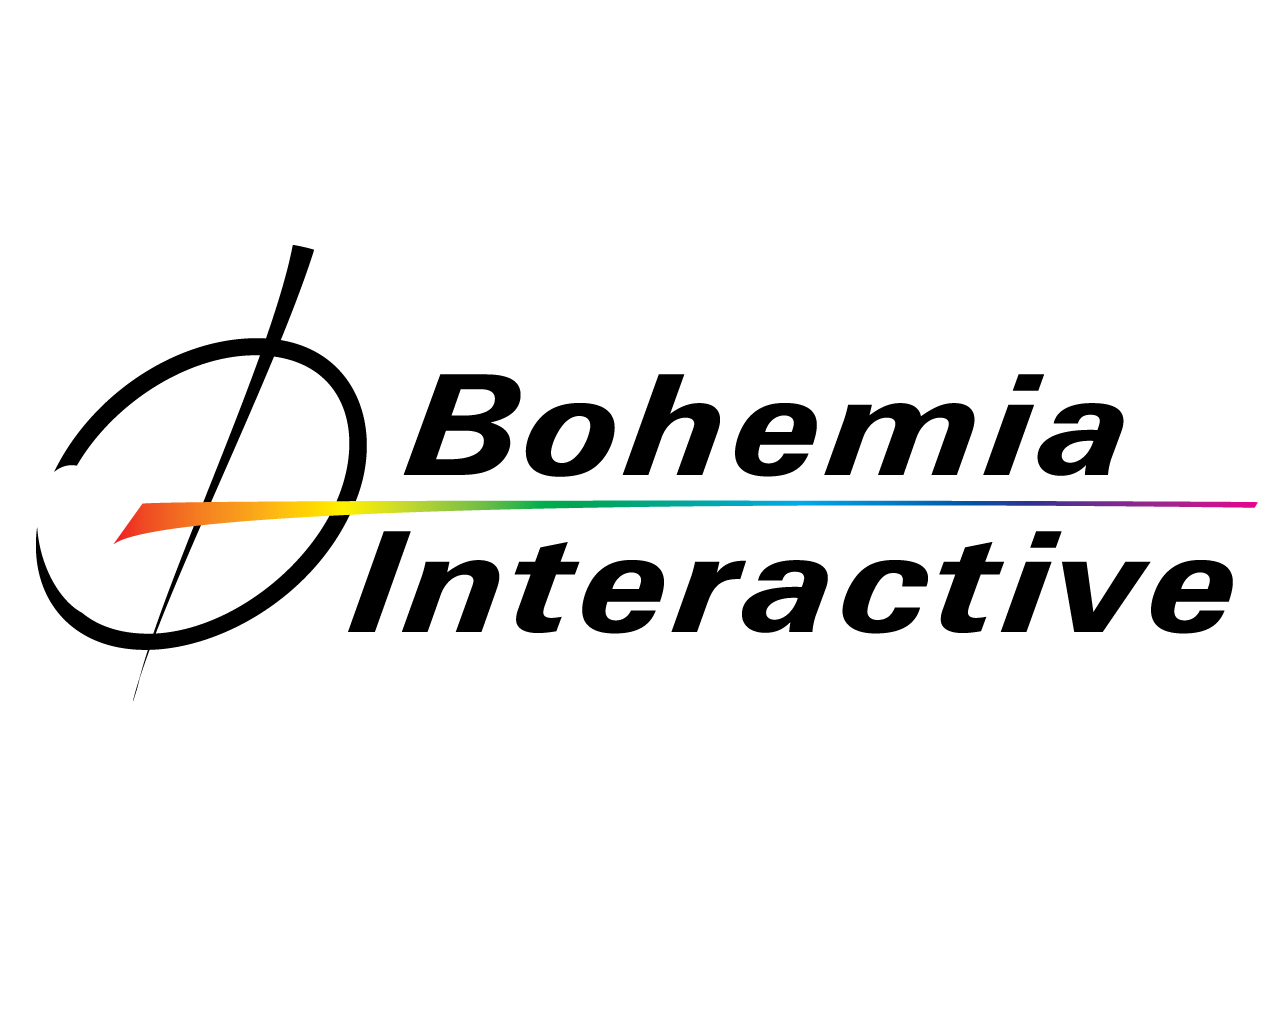 bohemia software